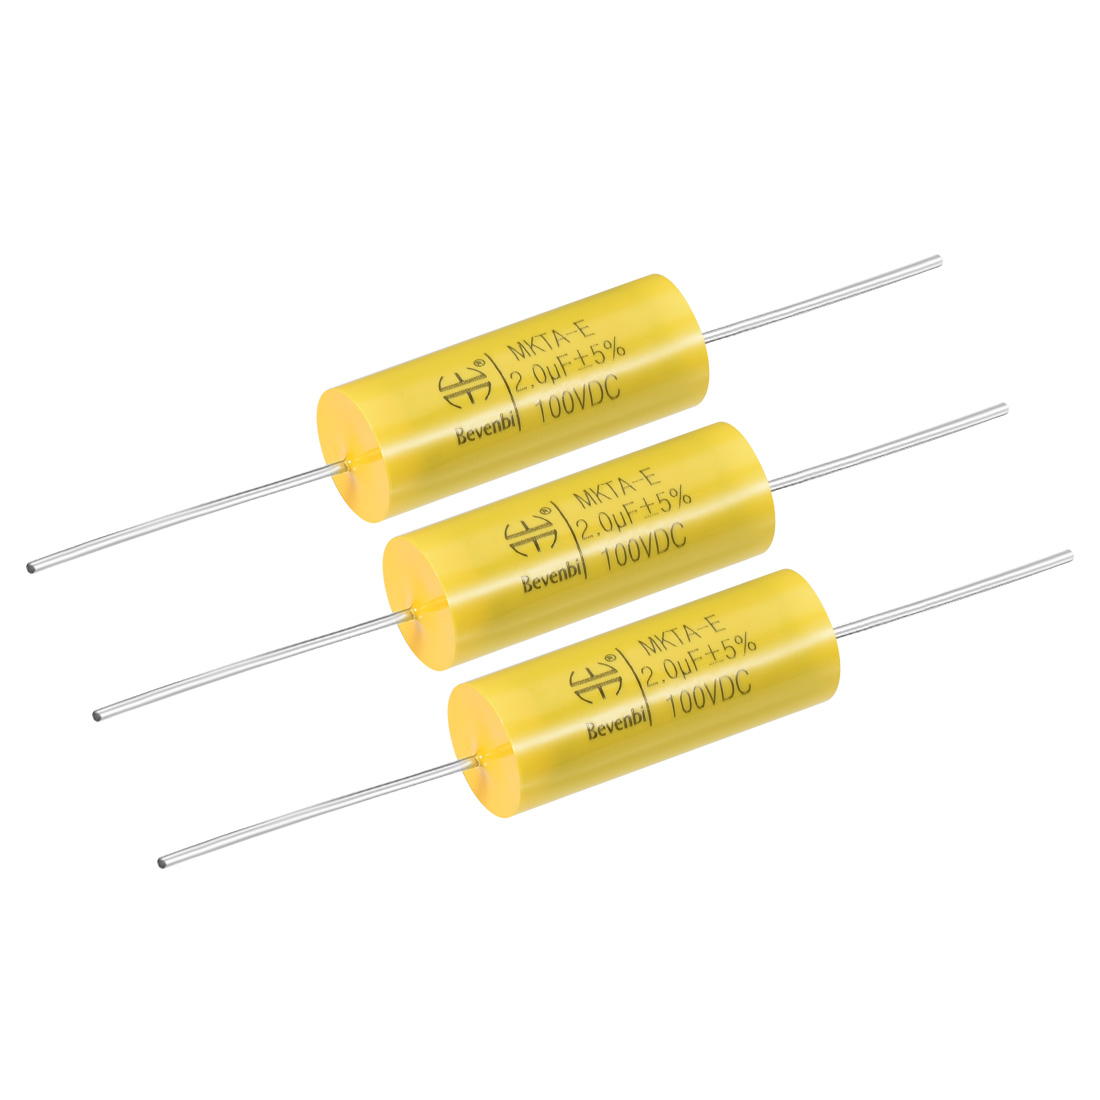 Film Capacitor 100V DC 2.0uF MKTA-E Round Polypropylene Capacitors Yellow 3pcs